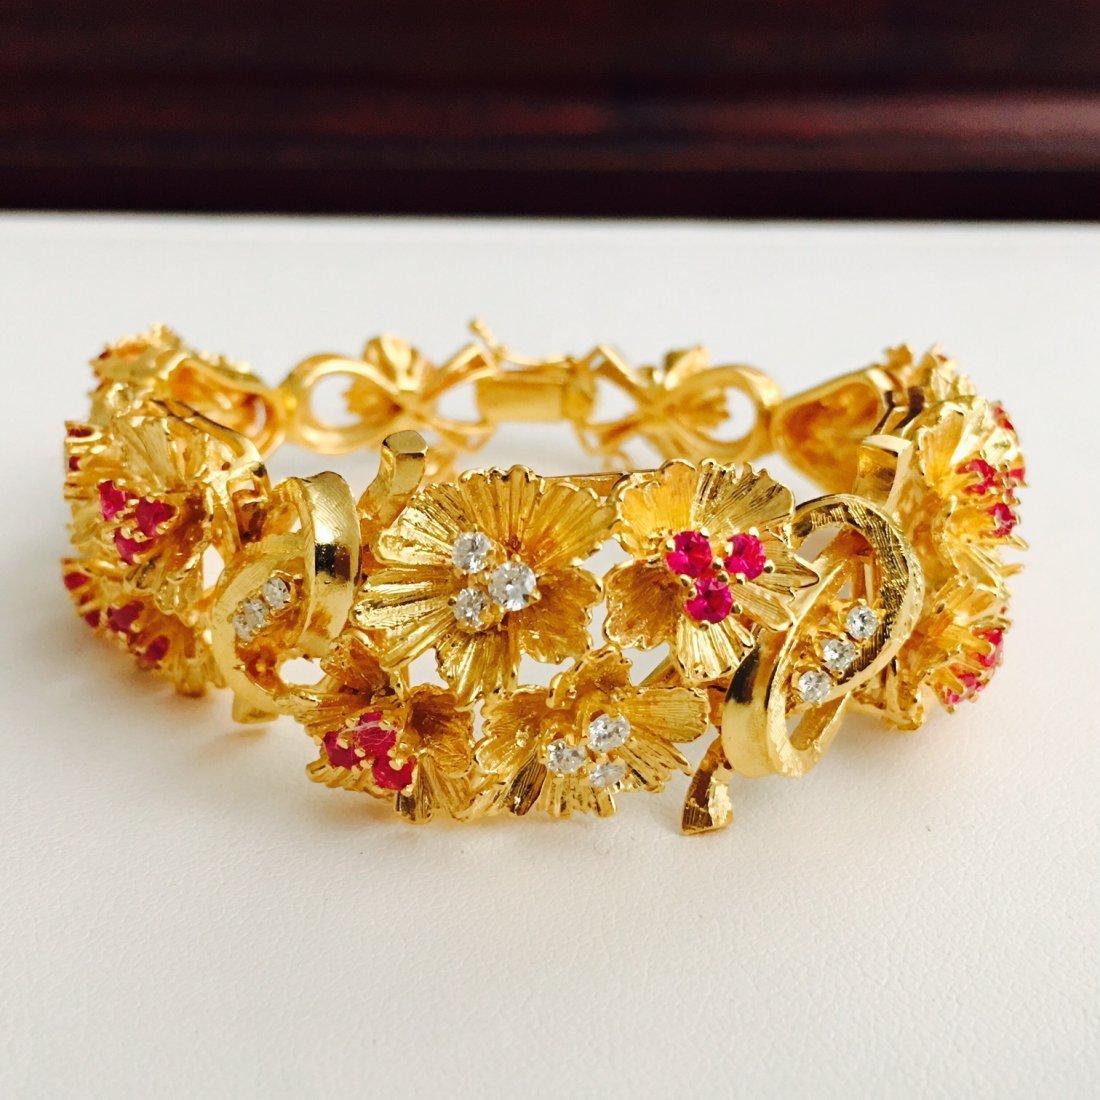 Vinatge 18K Gold 7 CARAT Burma Ruby Diamond Bracelet